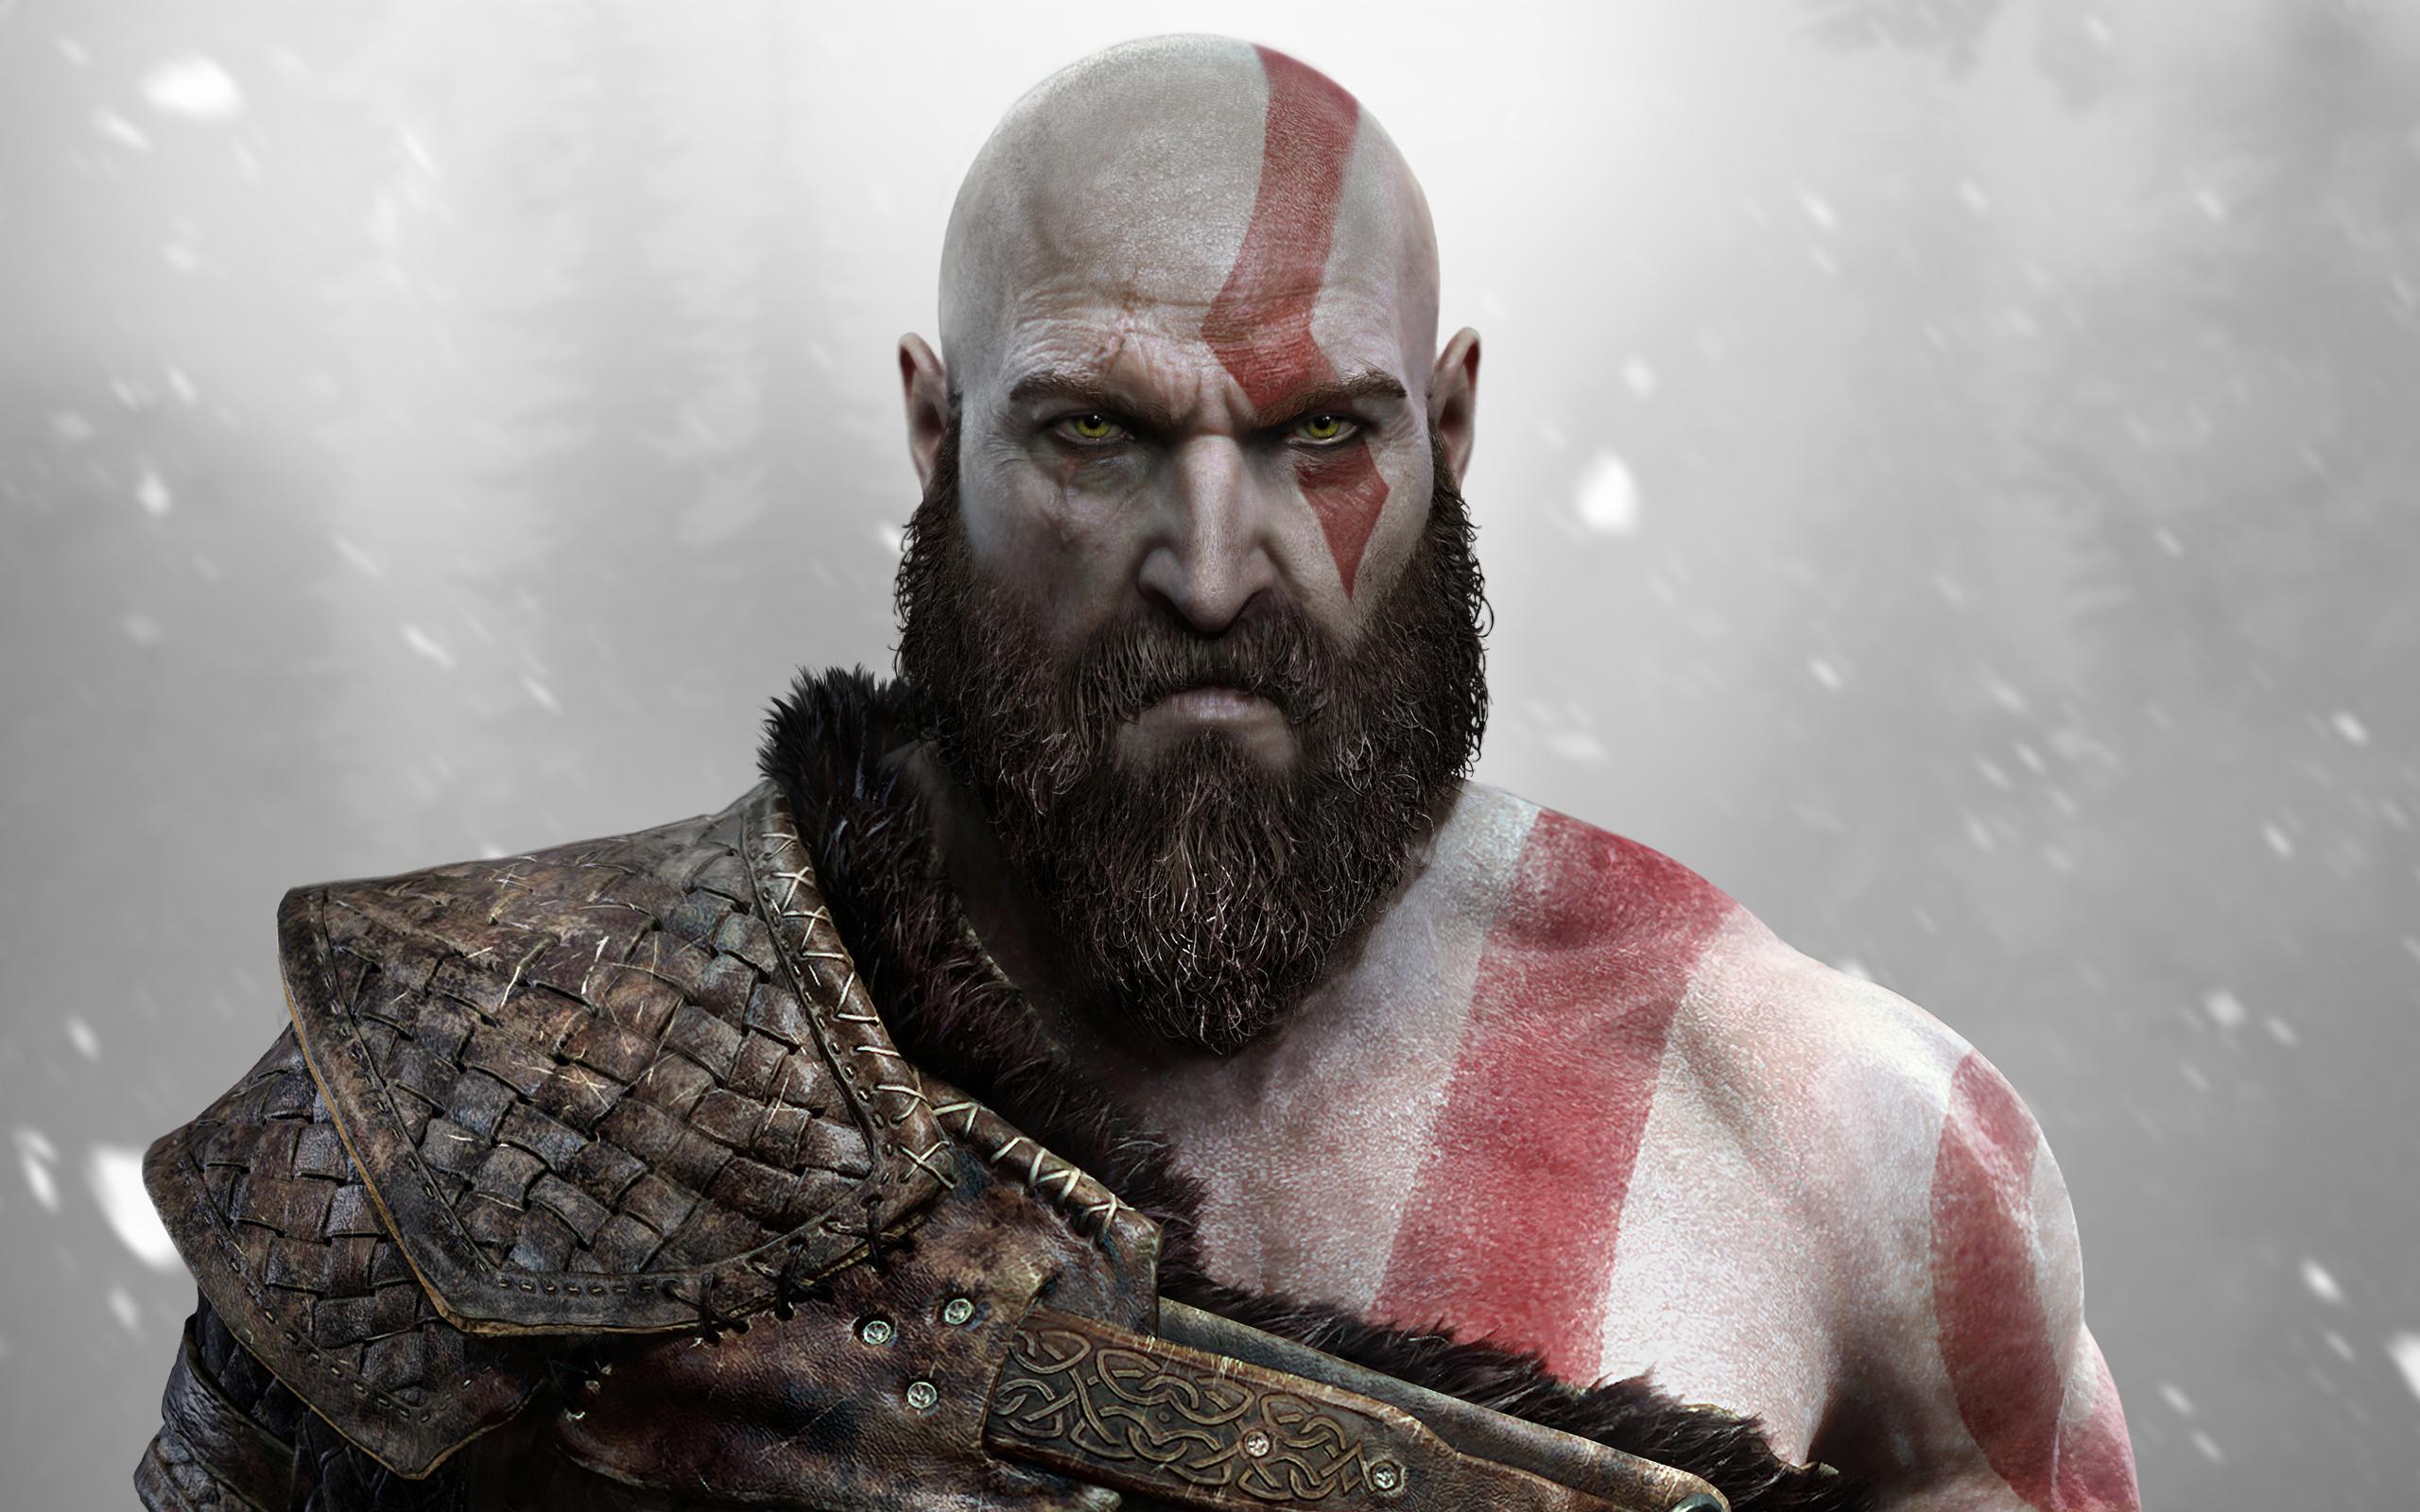 kratos-from-god-of-war-4k-5k-m7.jpg